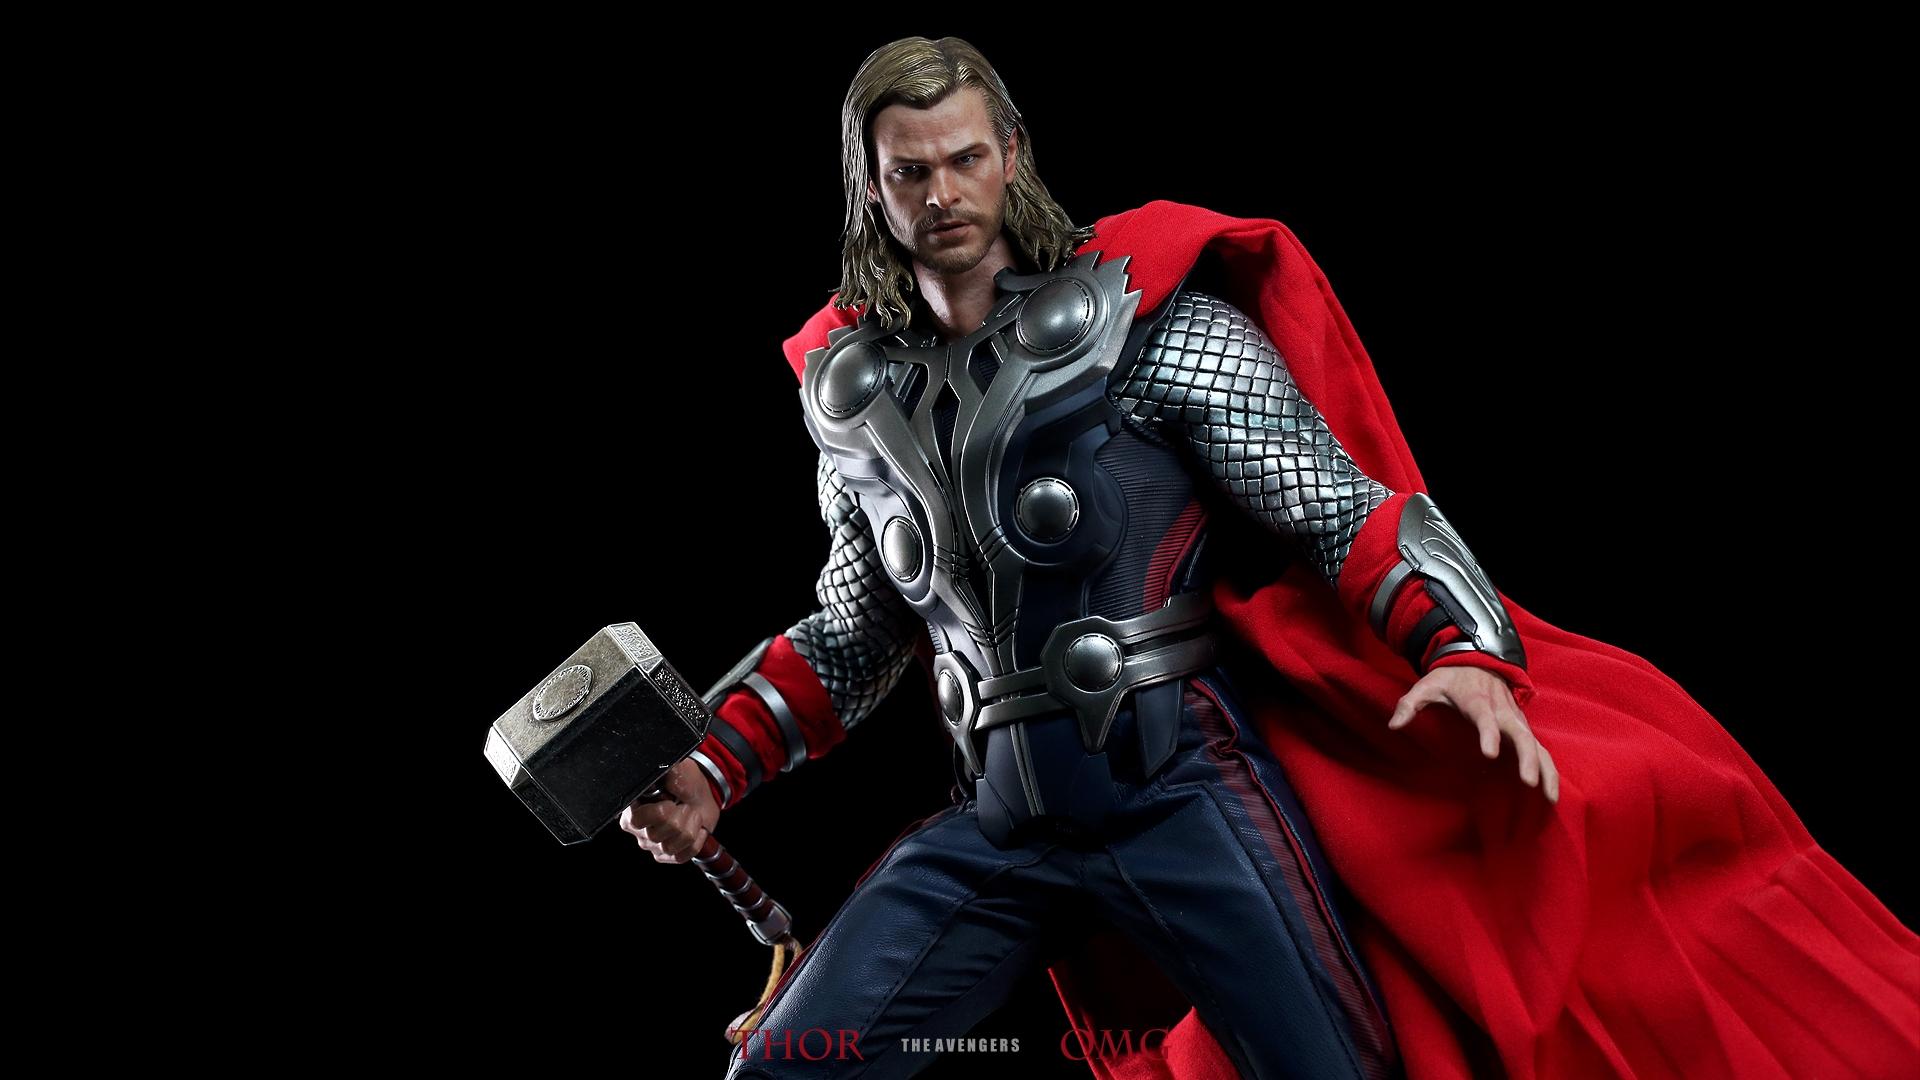 Thor The God Of Thunder Hd